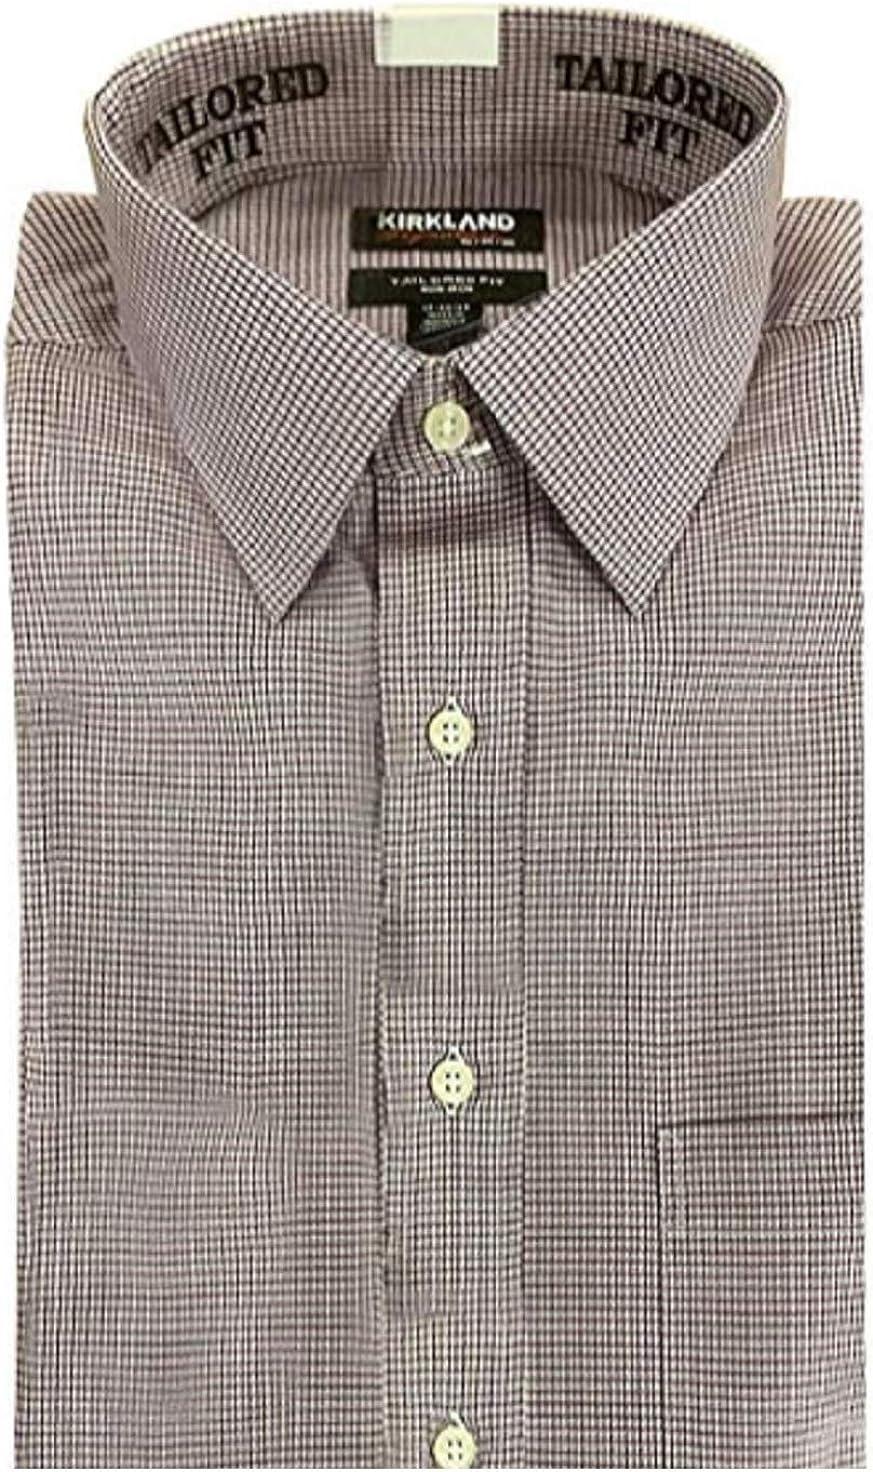 Kirkland Signature Men's Tailored Fit 100% Cotton Non-Iron Spread Collar Dress Shirt, Red Mini Grid